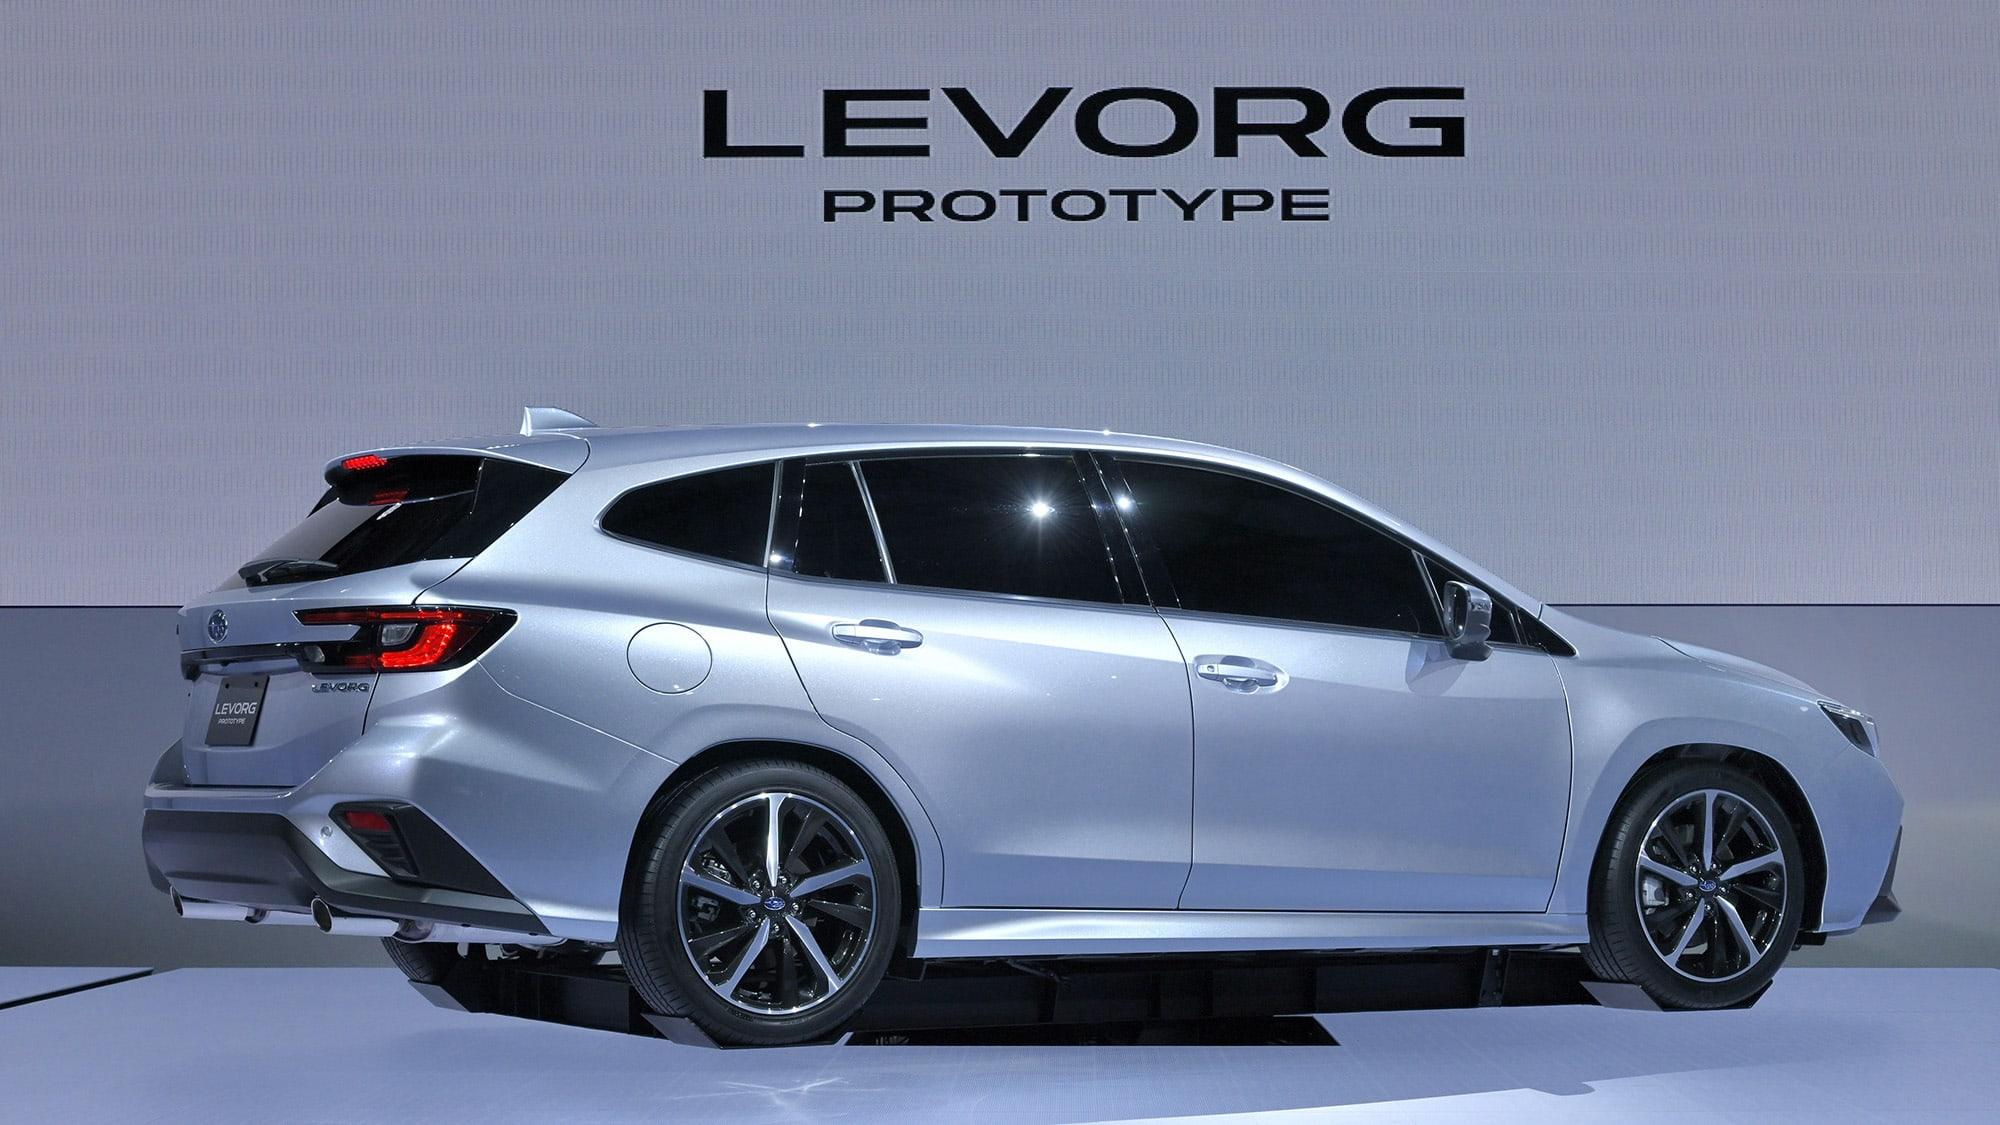 Subaru Levorg Prototype revealed: Production model coming in 2020